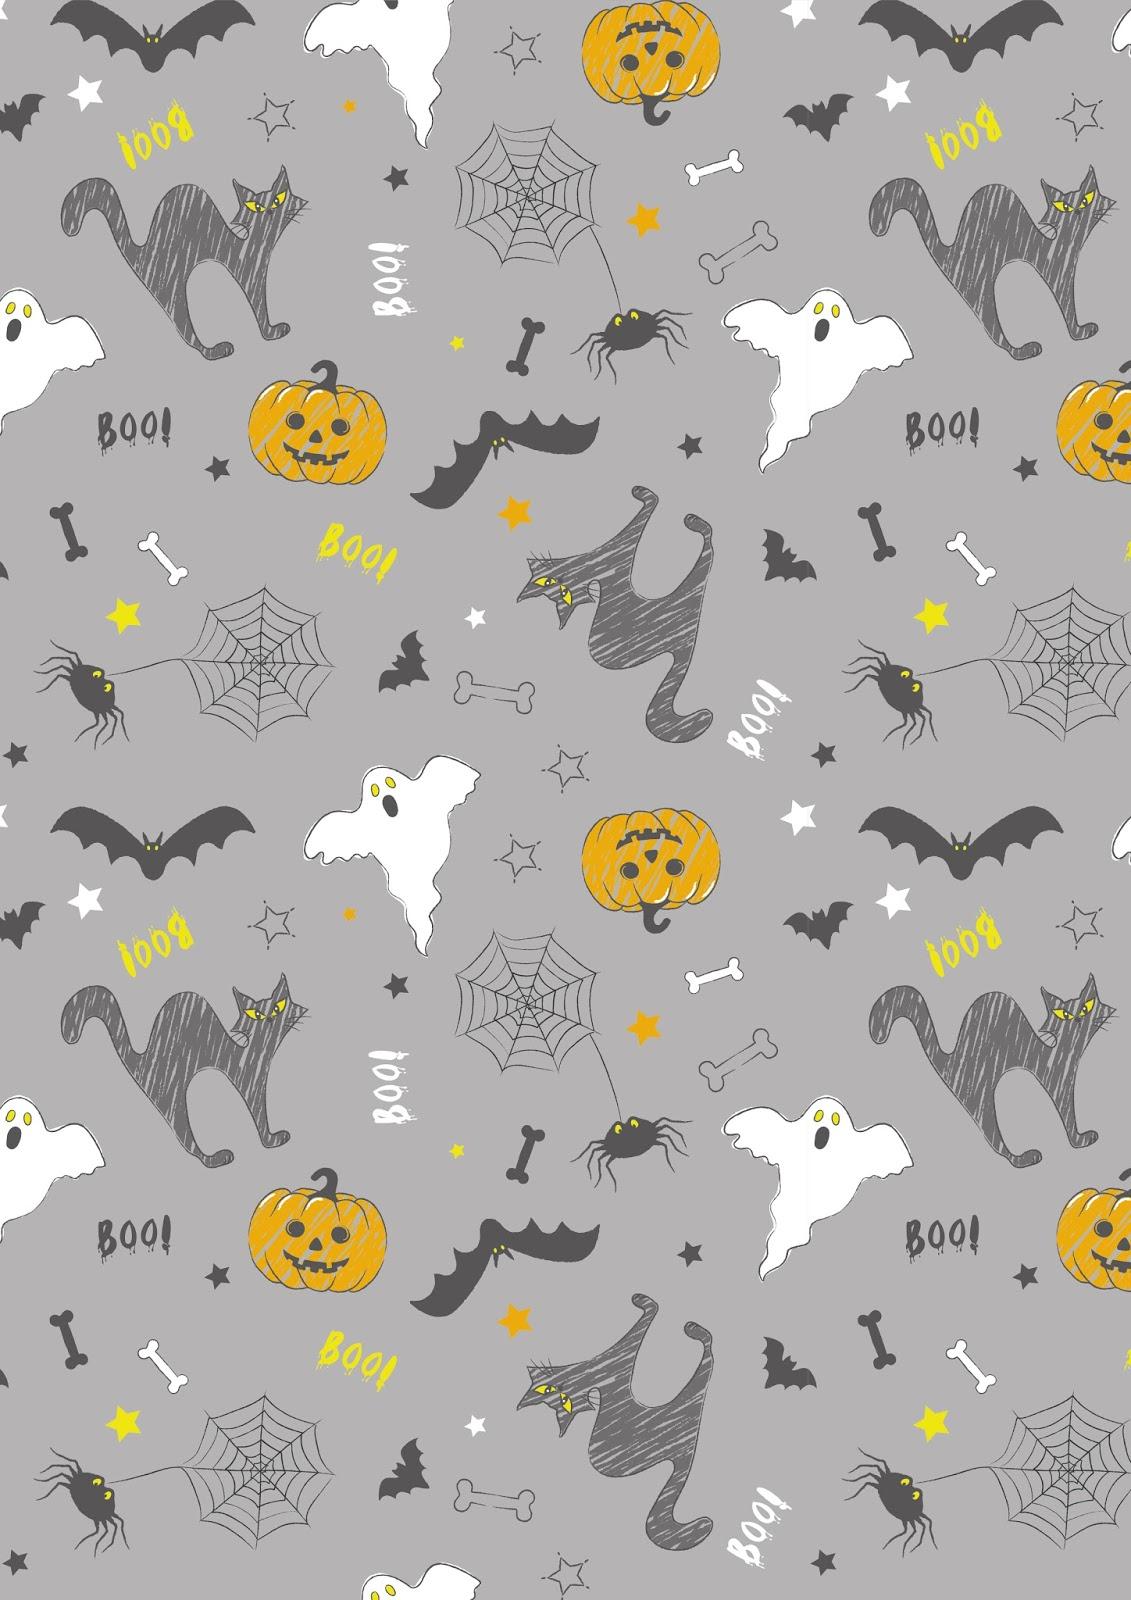 happy halloween everyone - Halloween Prints